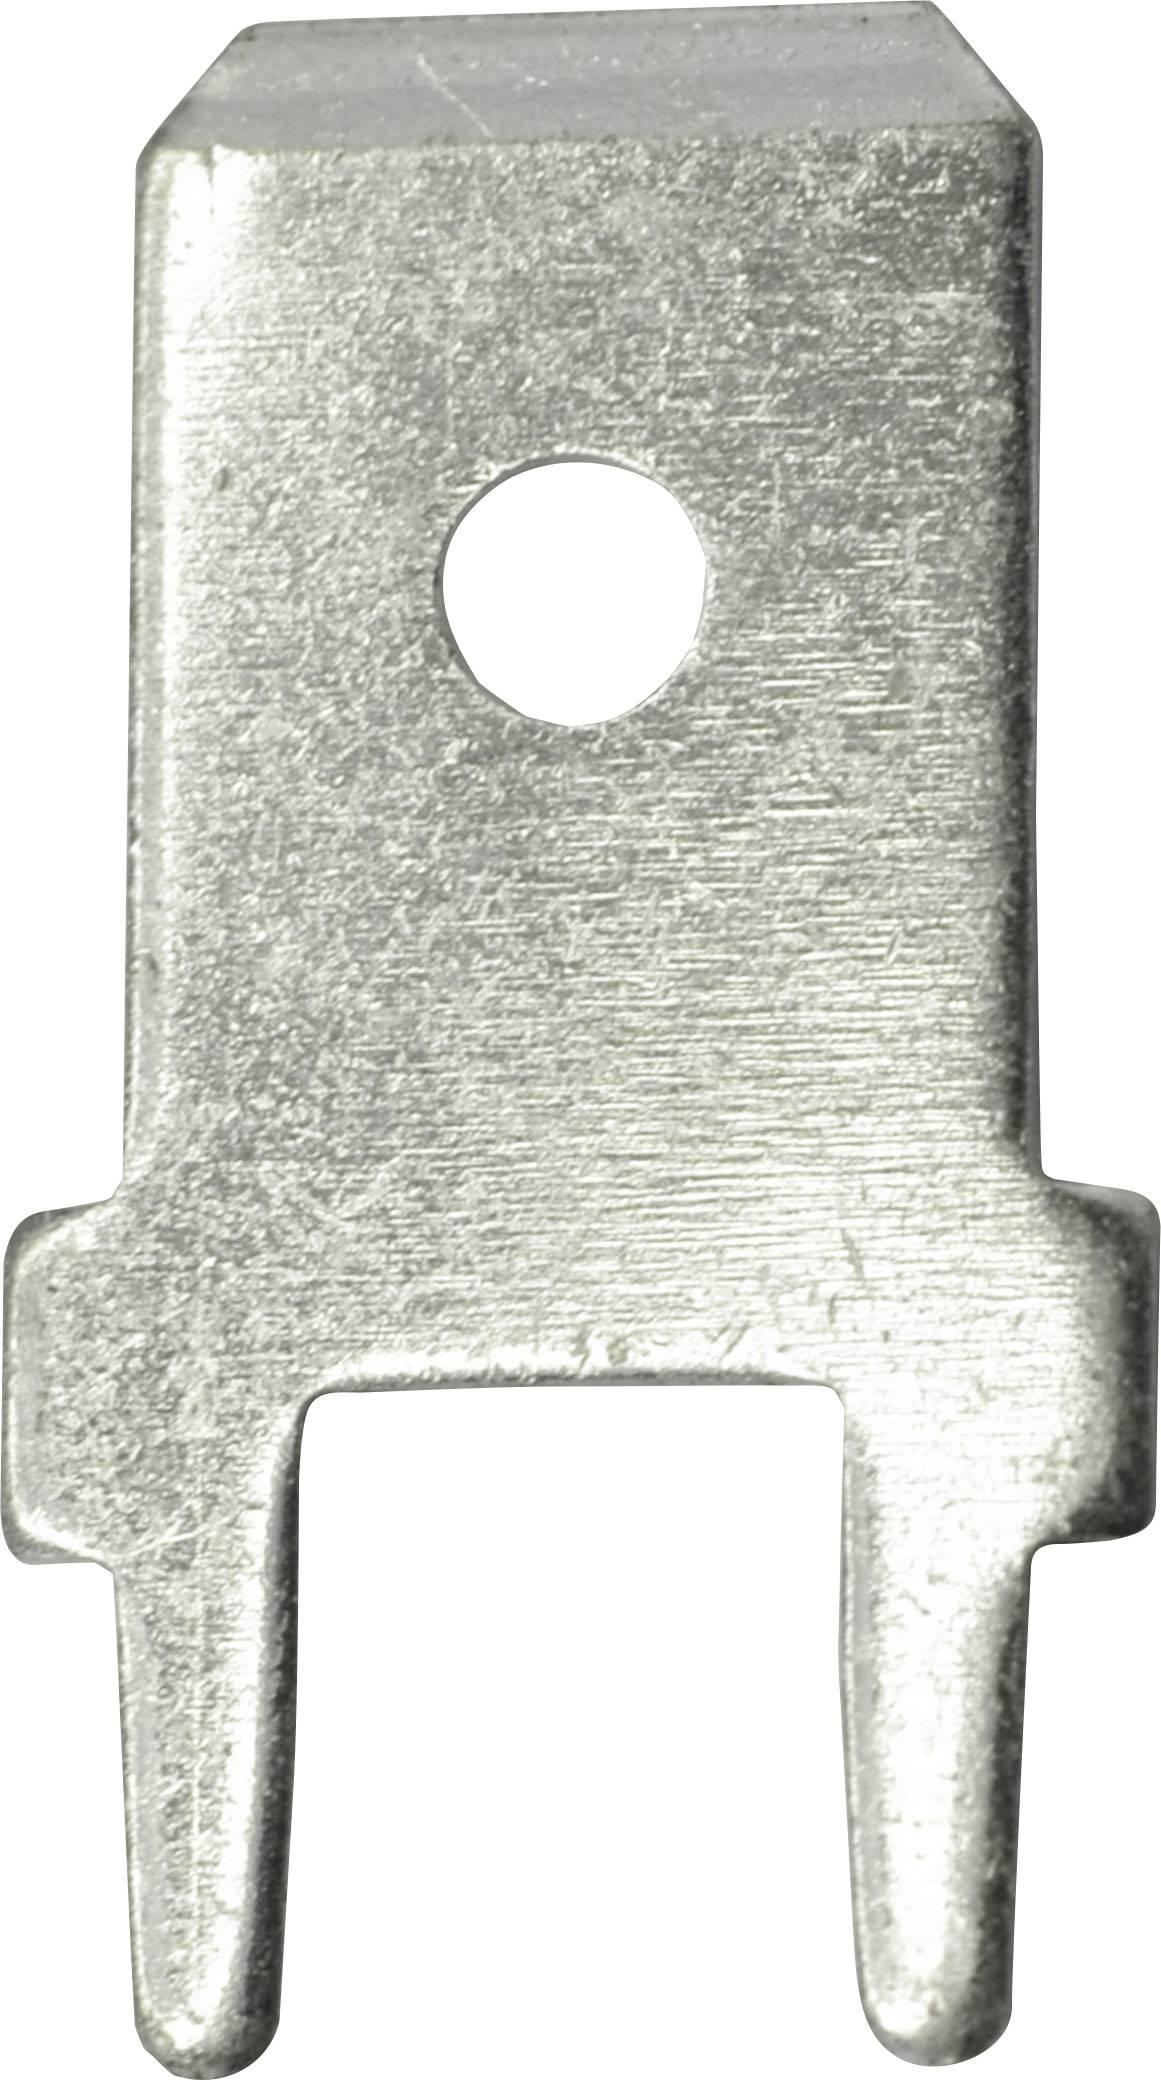 Faston zástrčka Vogt Verbindungstechnik 3866l.68 6.3 mm x 180 °, bez izolace, kov, 100 ks